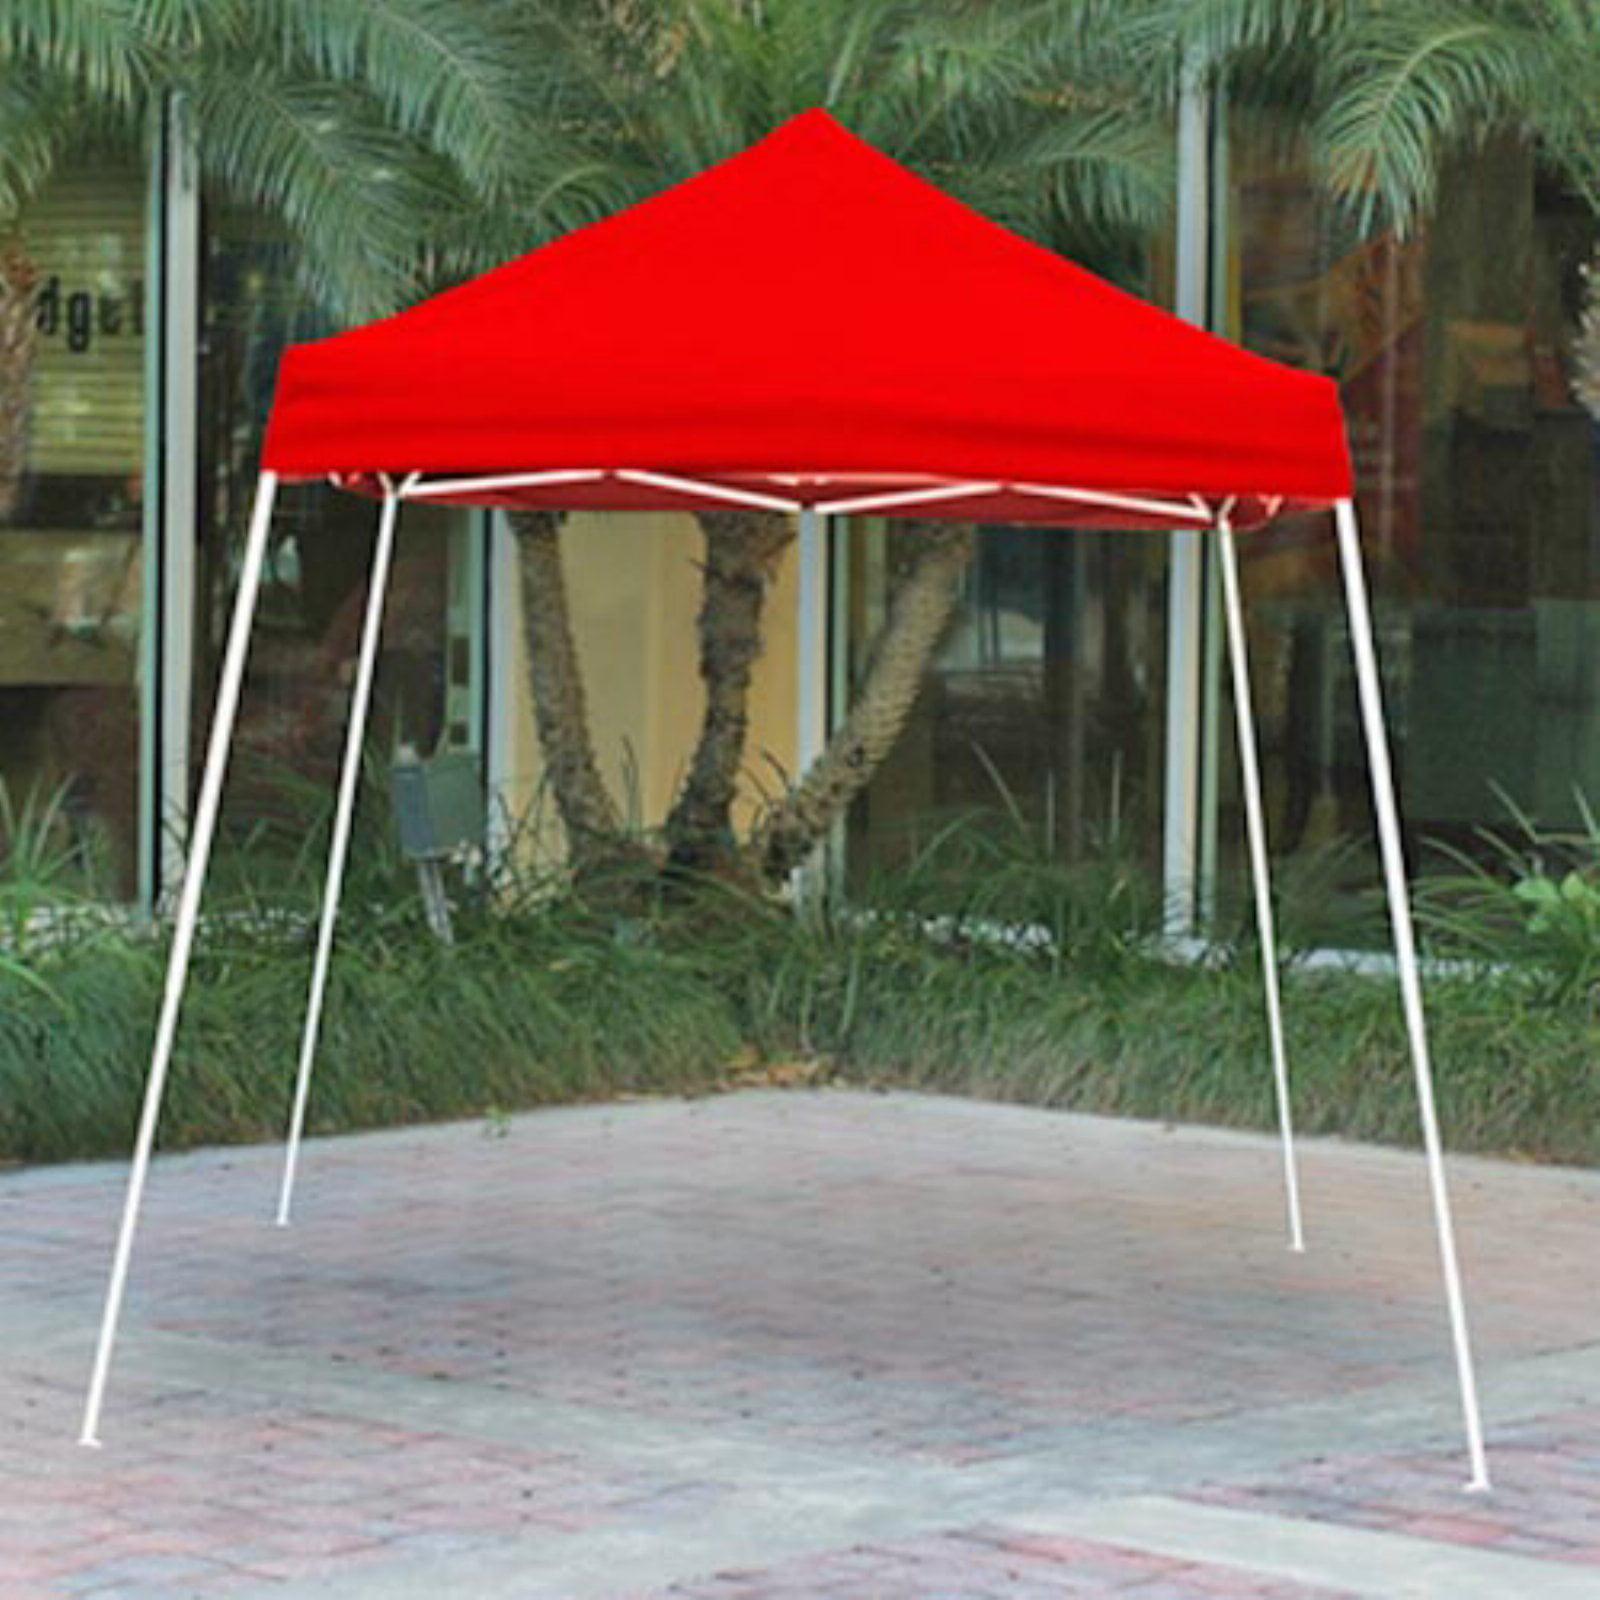 & 8u0027 x 8u0027 Sport Pop-up Canopy Slant Leg Red Cover - Walmart.com